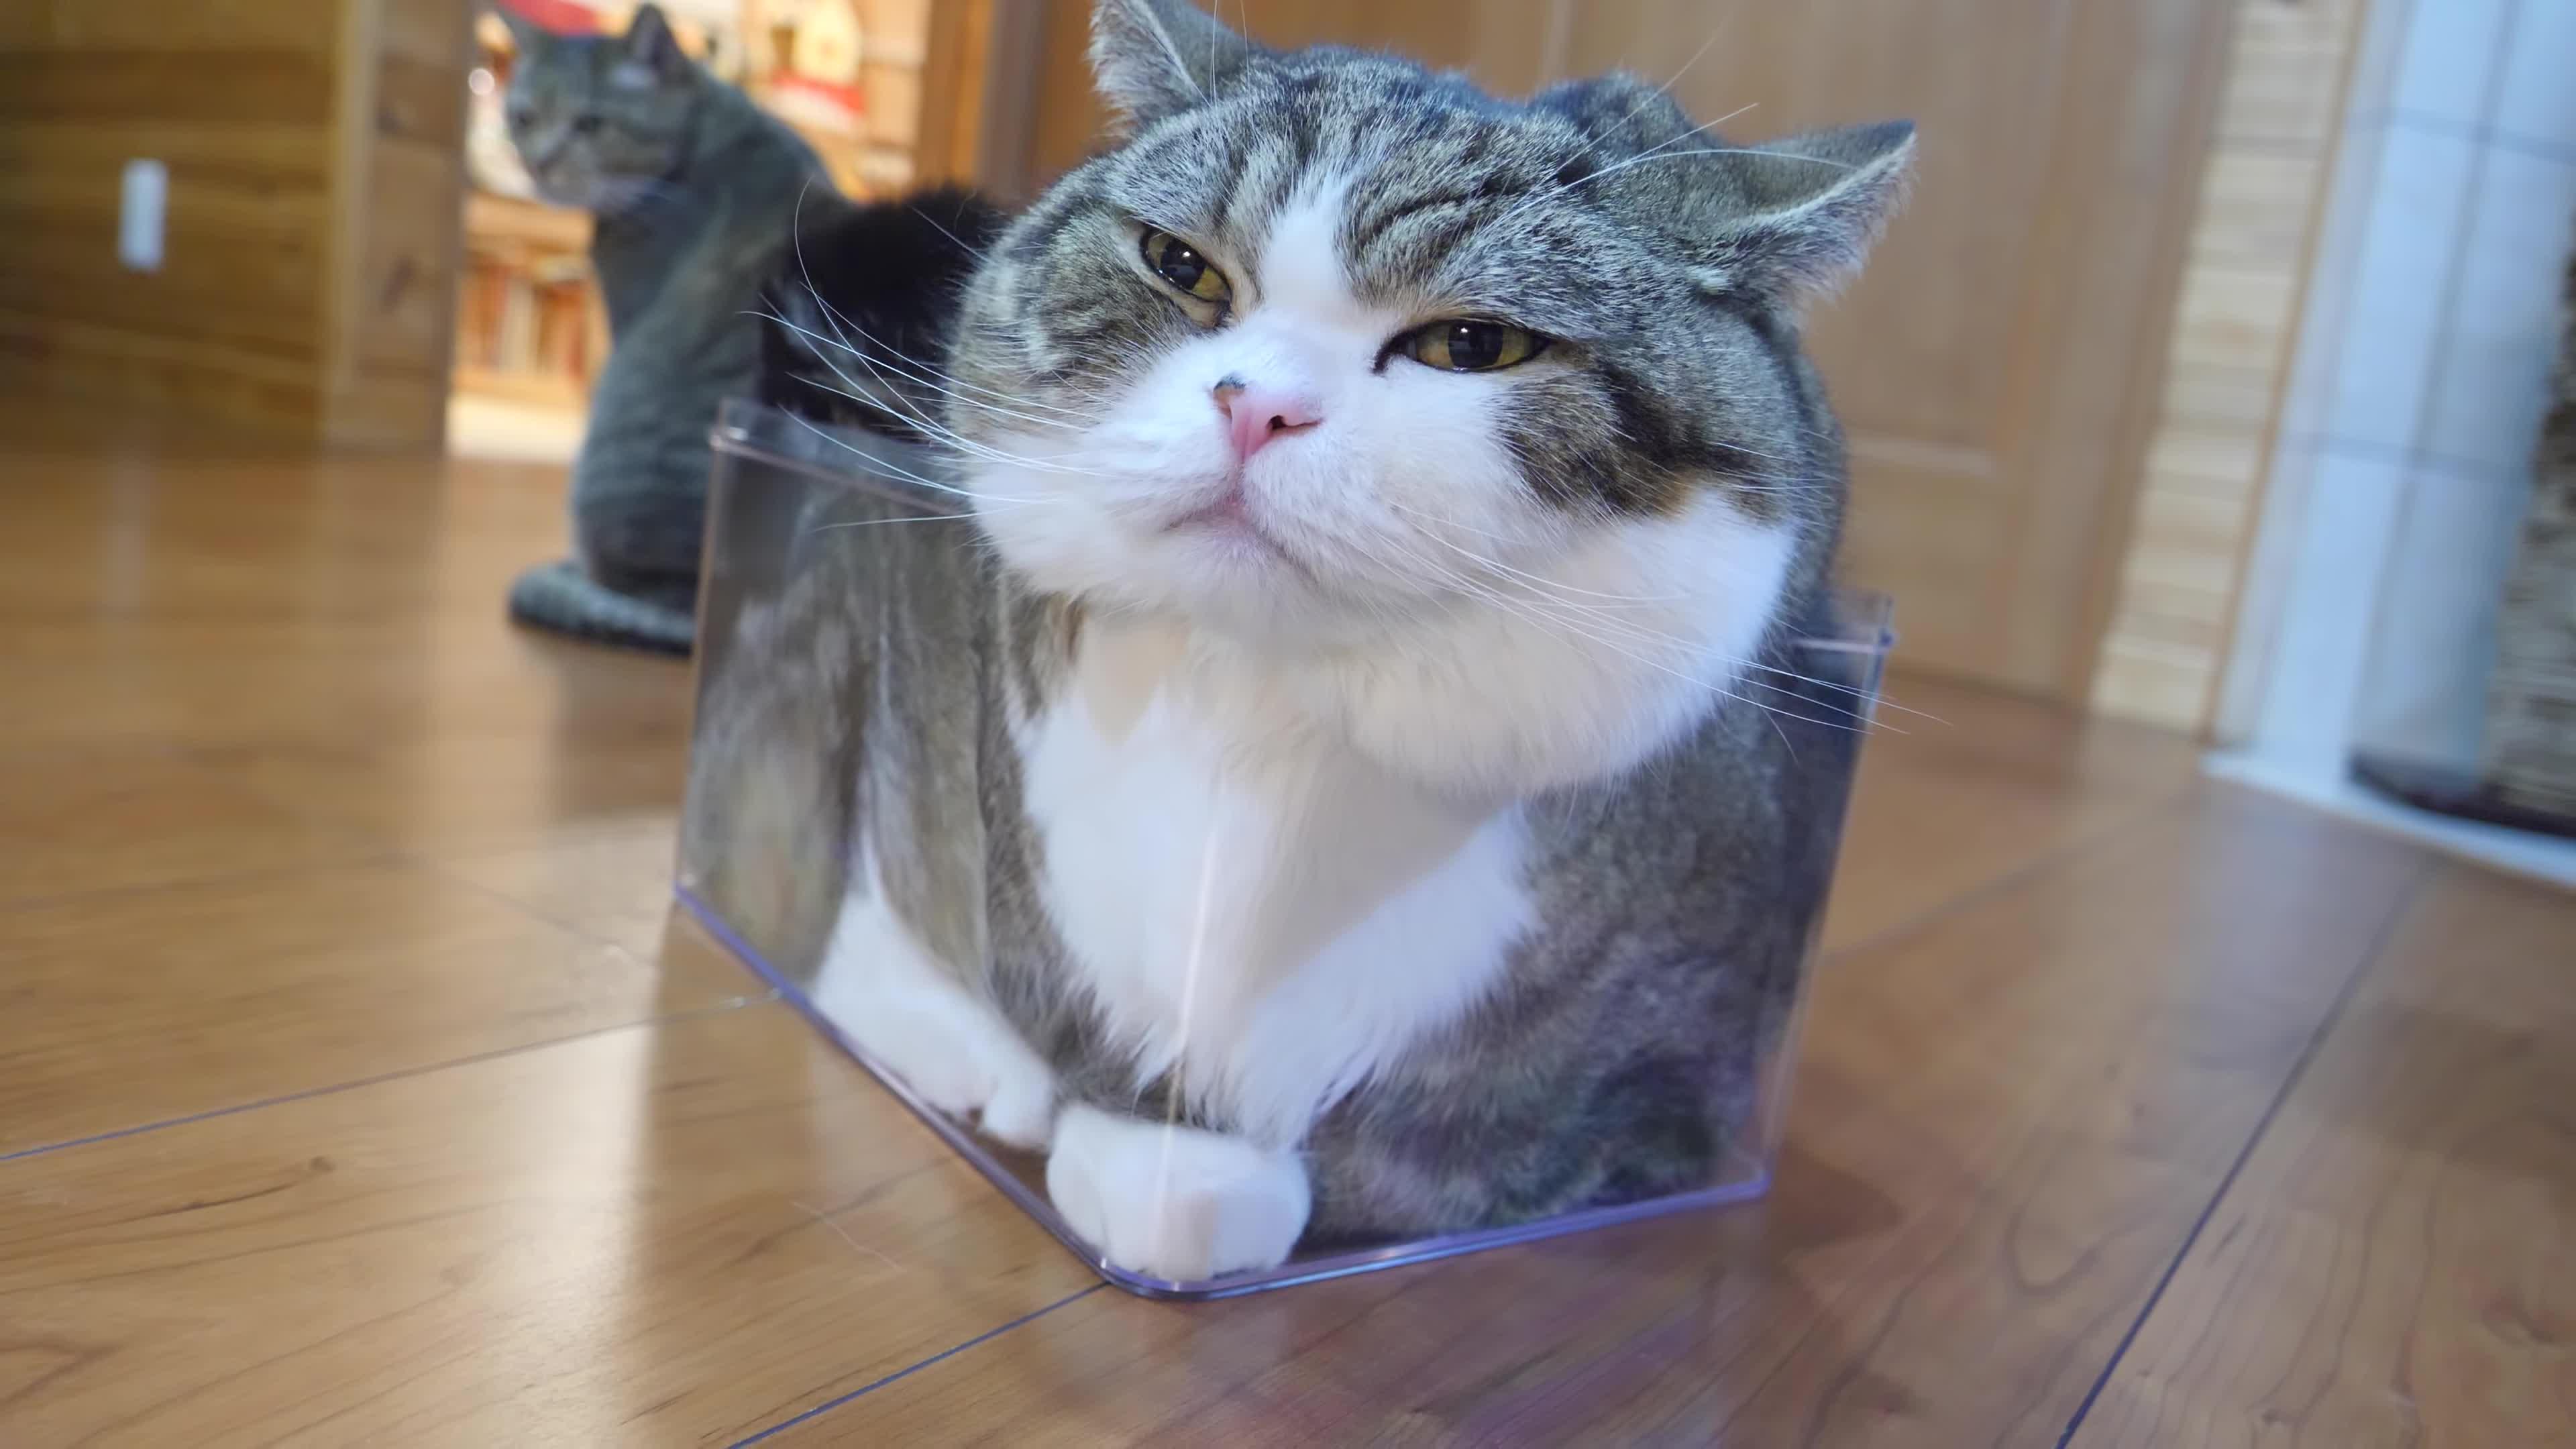 Just loafing around... GIFs